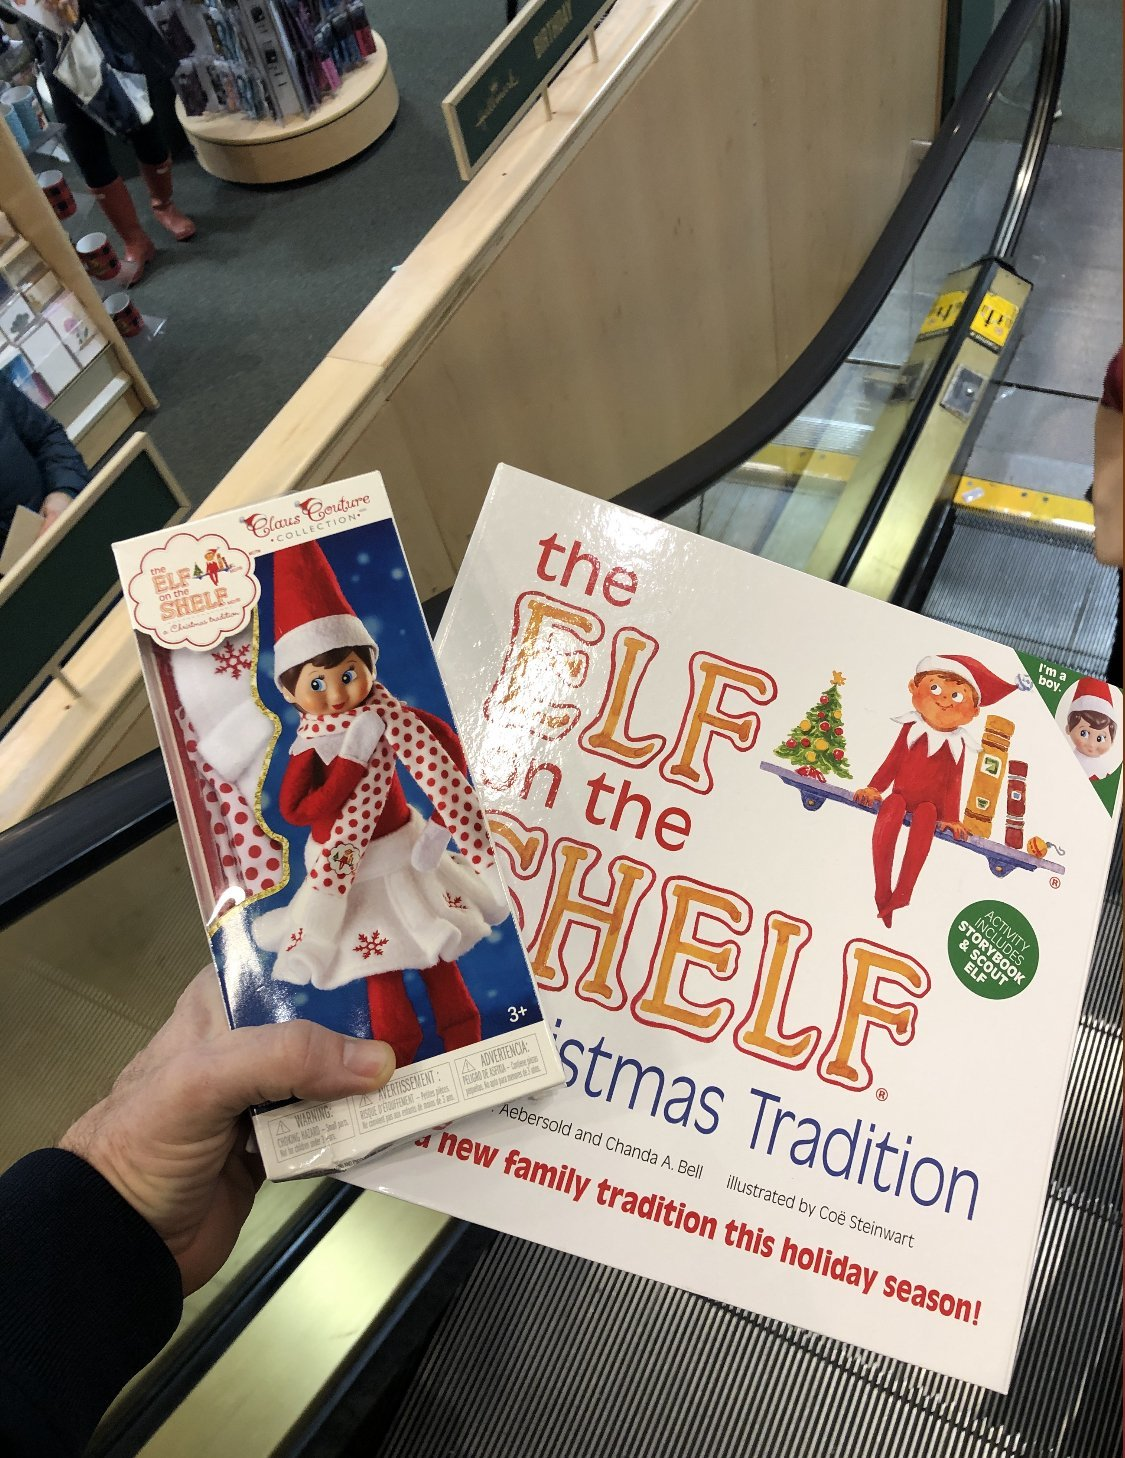 that damn elf on the shelf